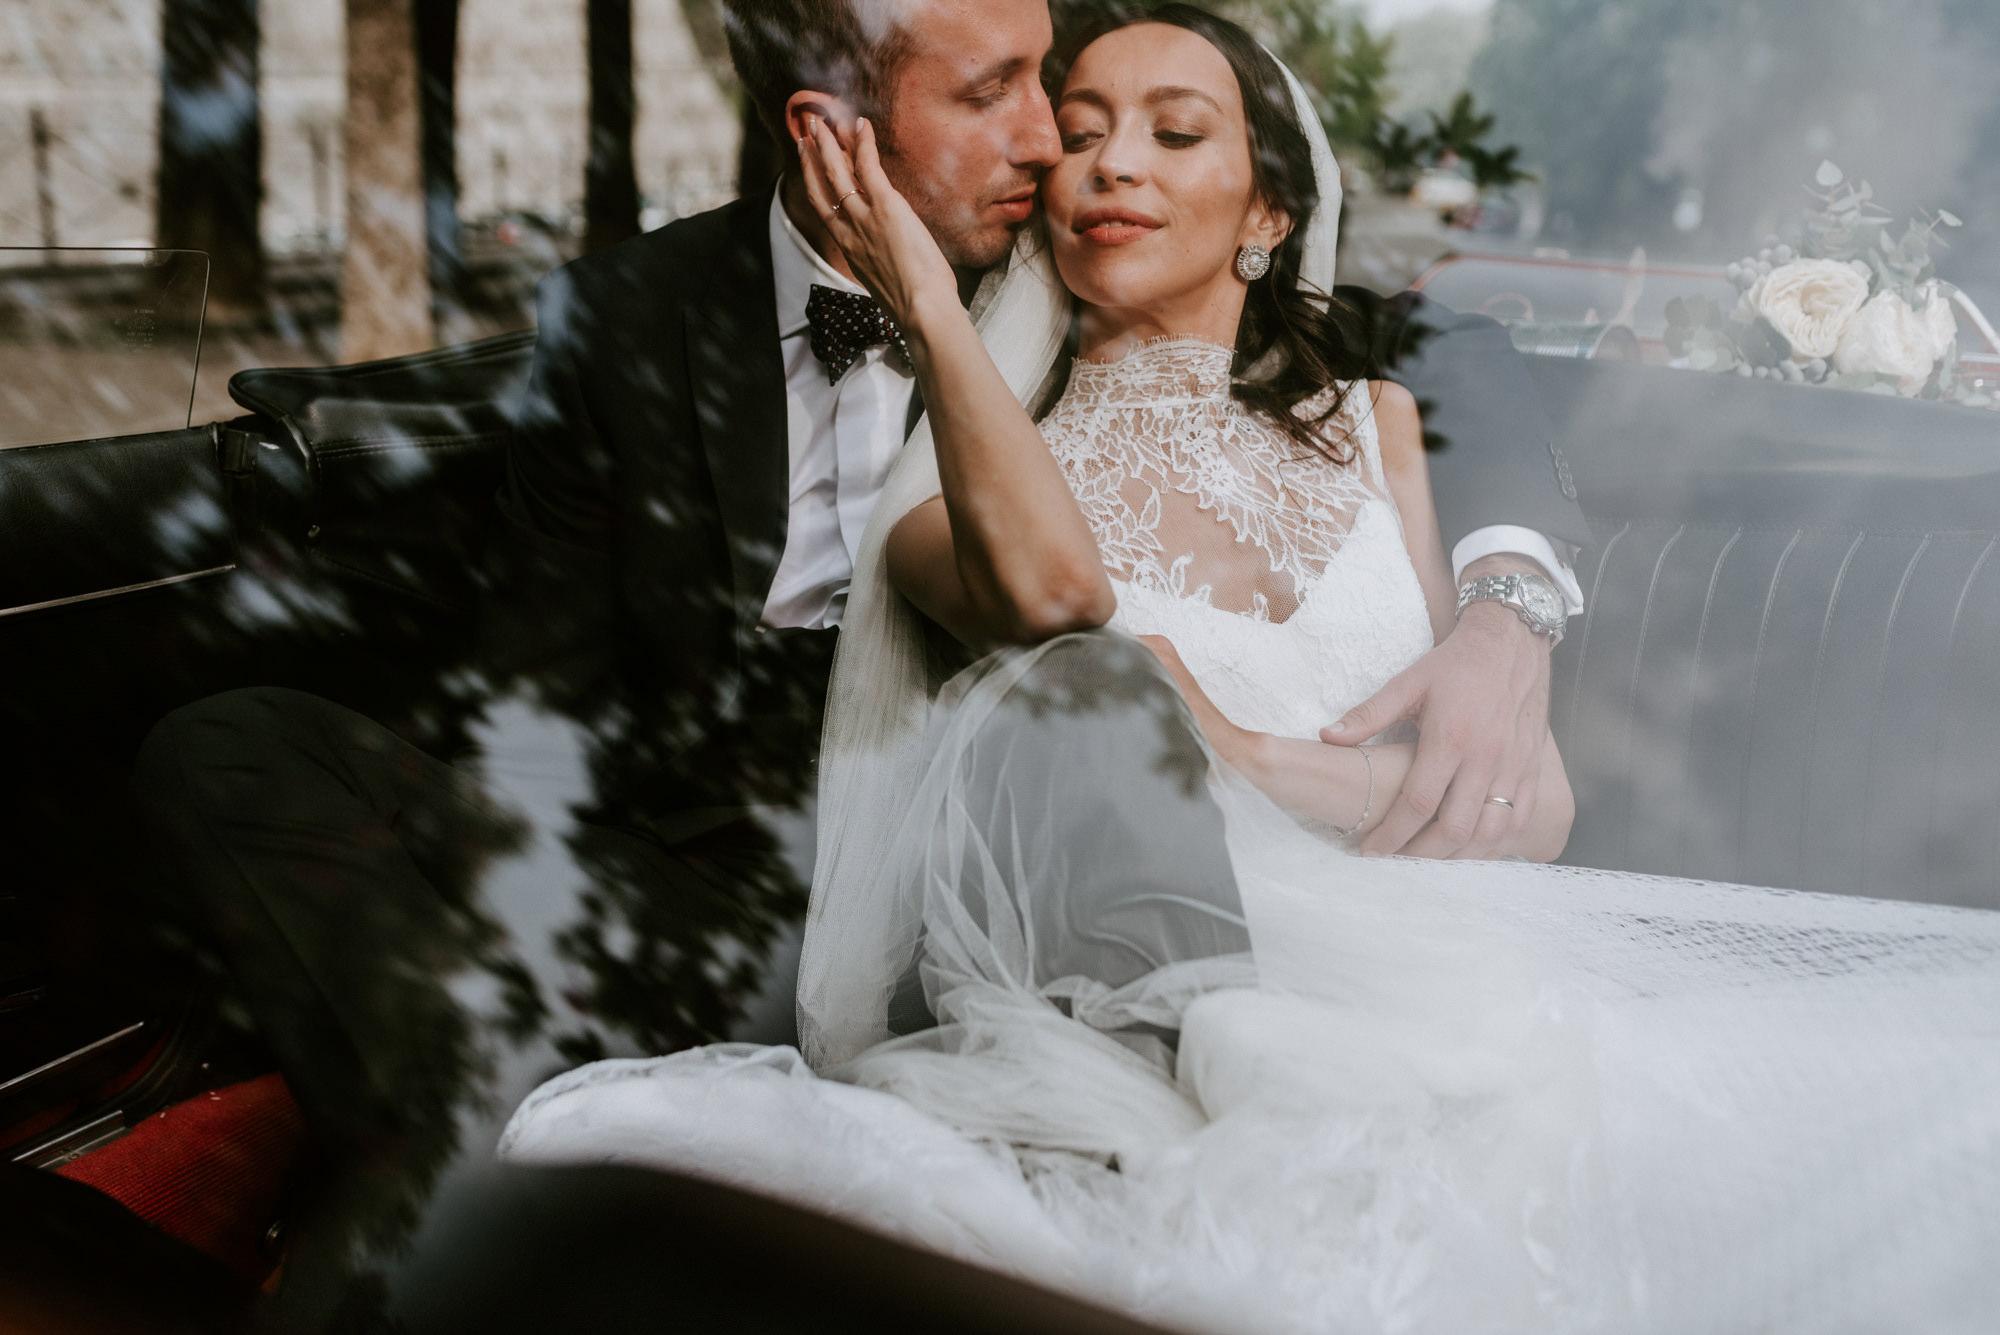 FOTO+PHOTO+BODA+WEDDING+ITALIA+ITALY+MAURICIO+GARAY+MAURICIOGARAY+WEDDINPHOTOGRAPHER+FOTOGRAFODEBODA-1334.jpg